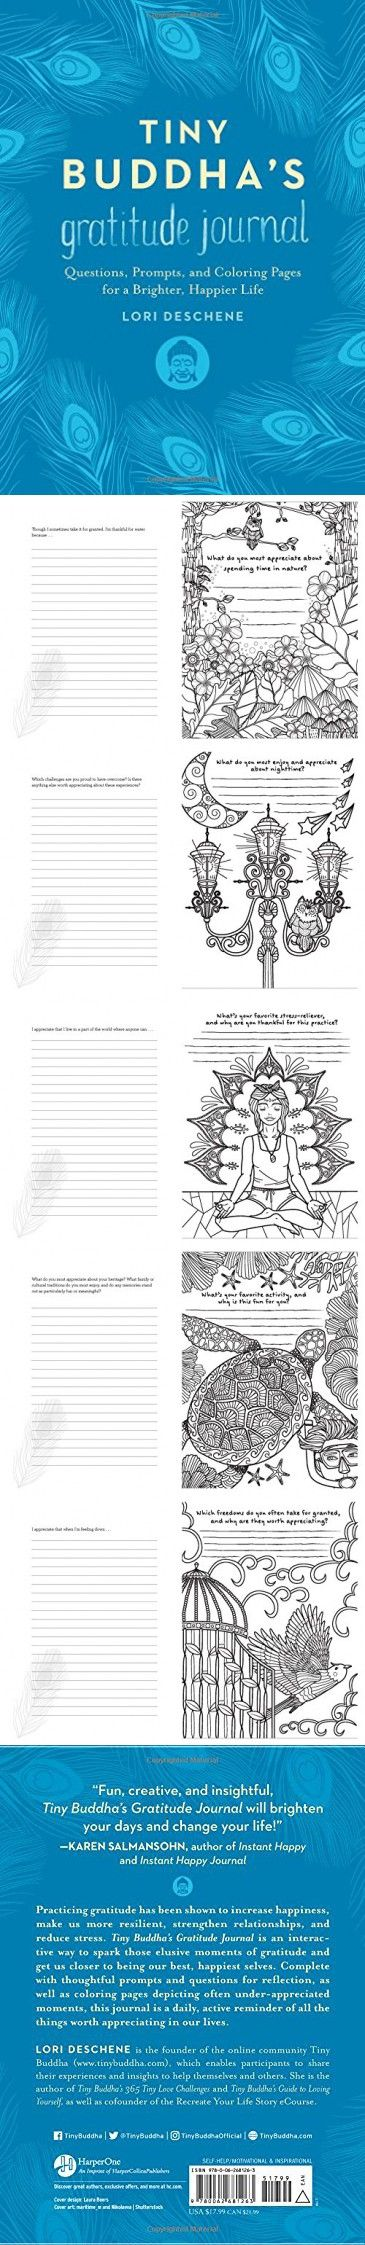 Mejores 10 imágenes de Coloring Books en Pinterest | Libros para ...